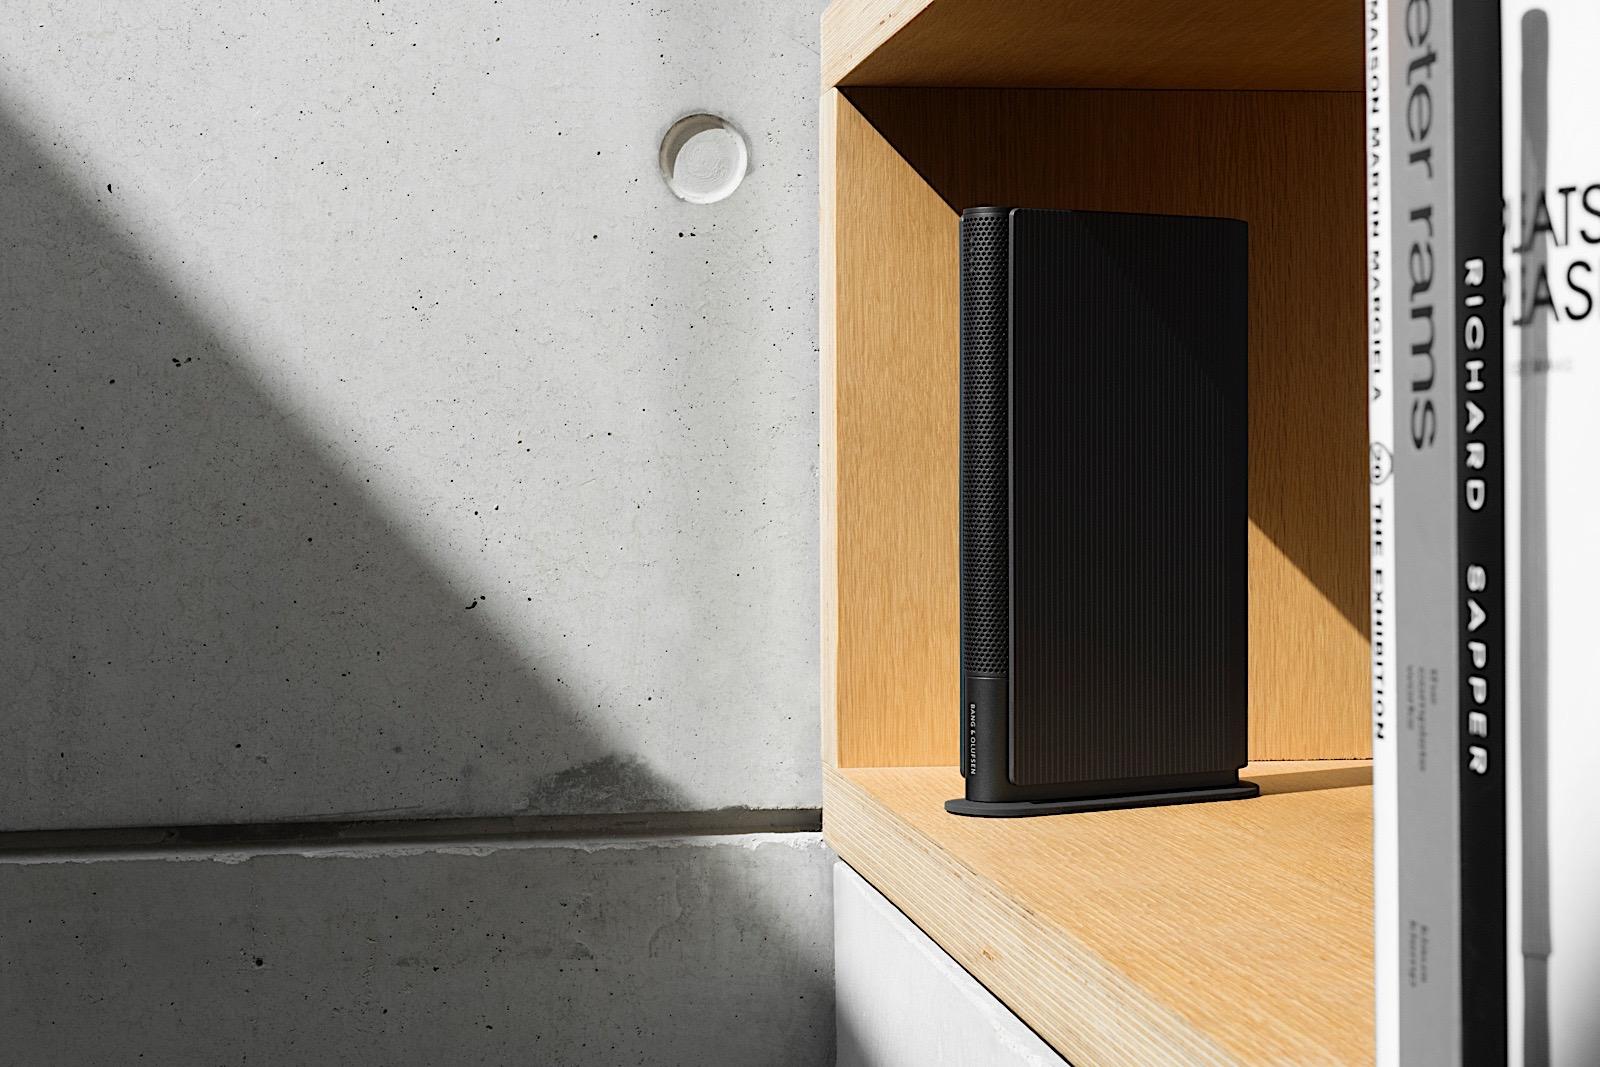 L'ultimo altoparlante Bang & Olufsen sembra un libro